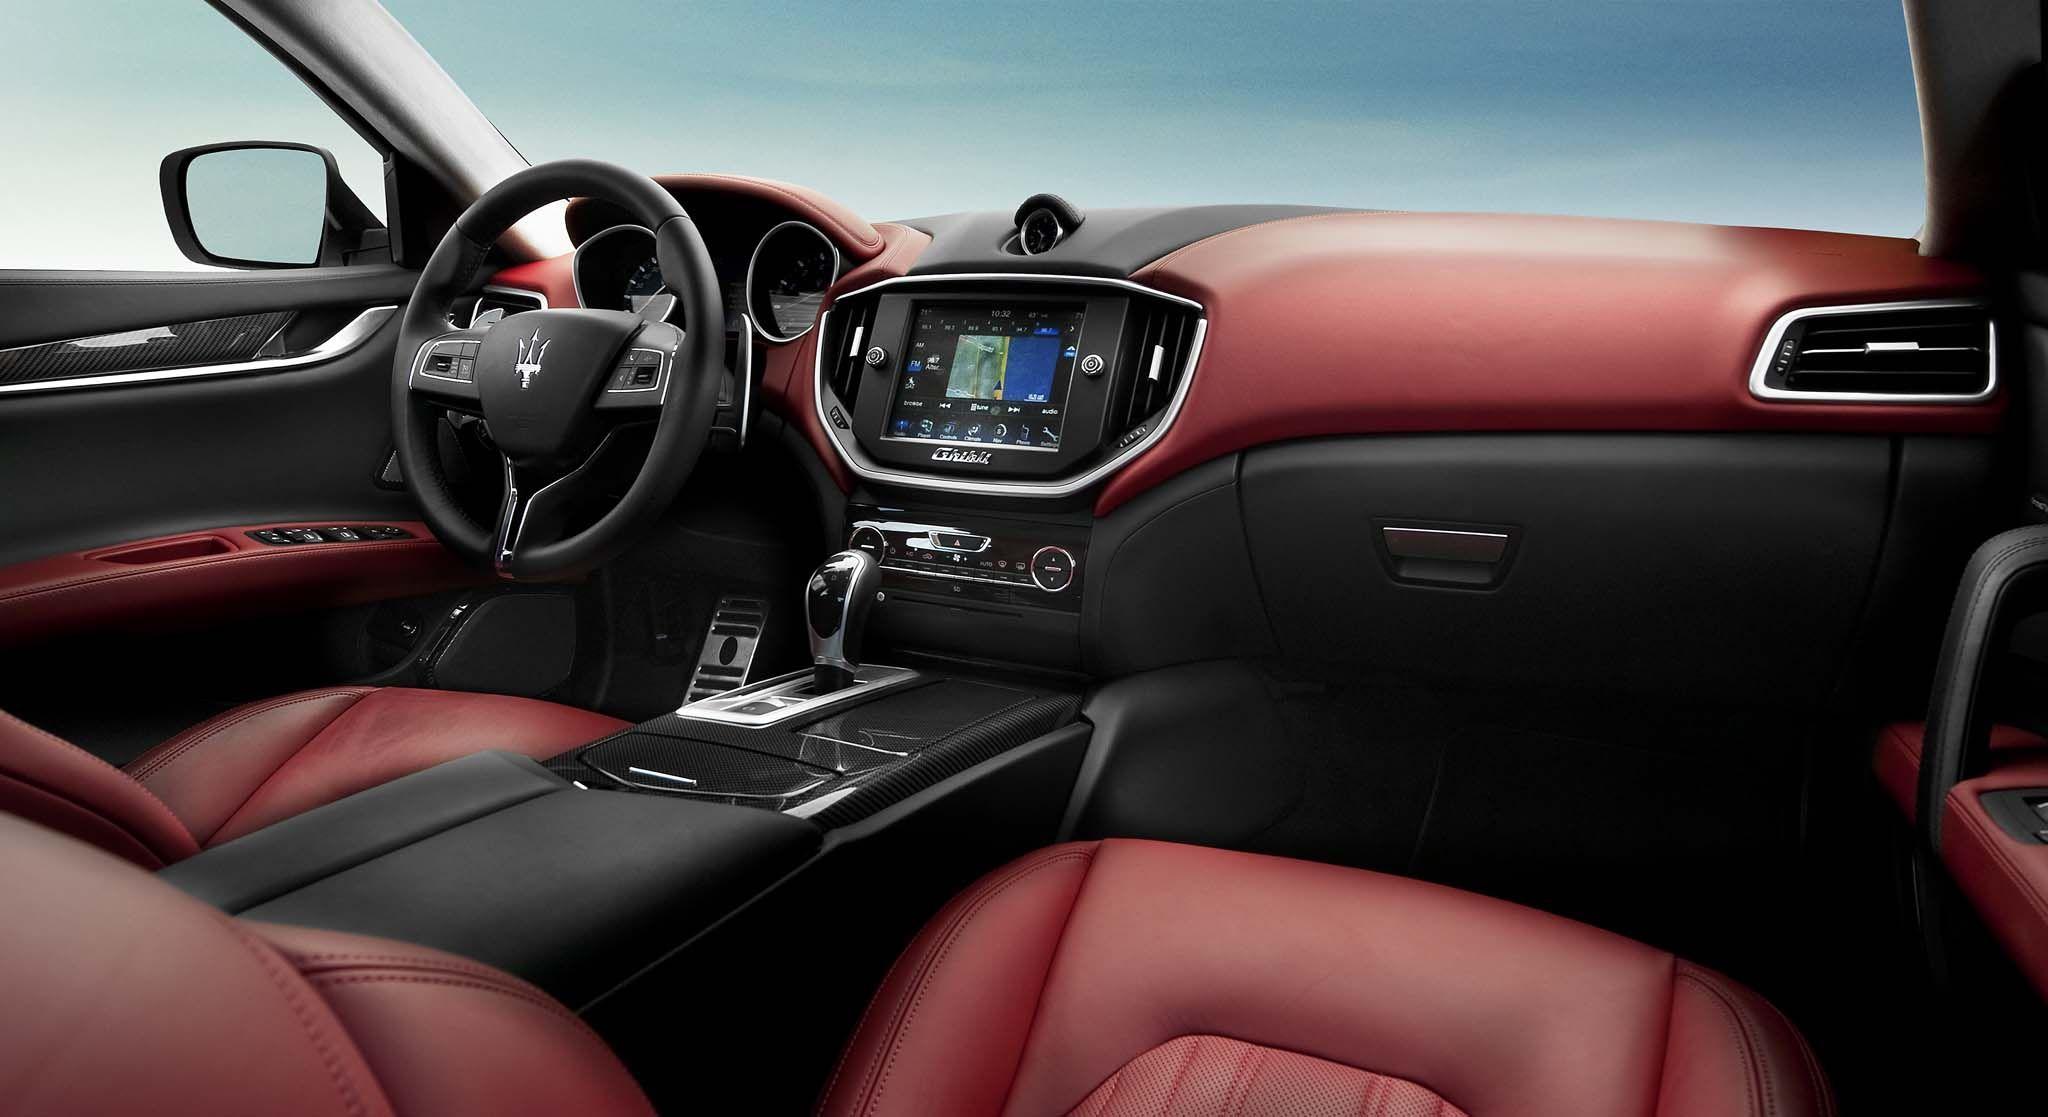 2014 Maserati Ghibli S Q4 Interior | Overpowering | Pinterest ...